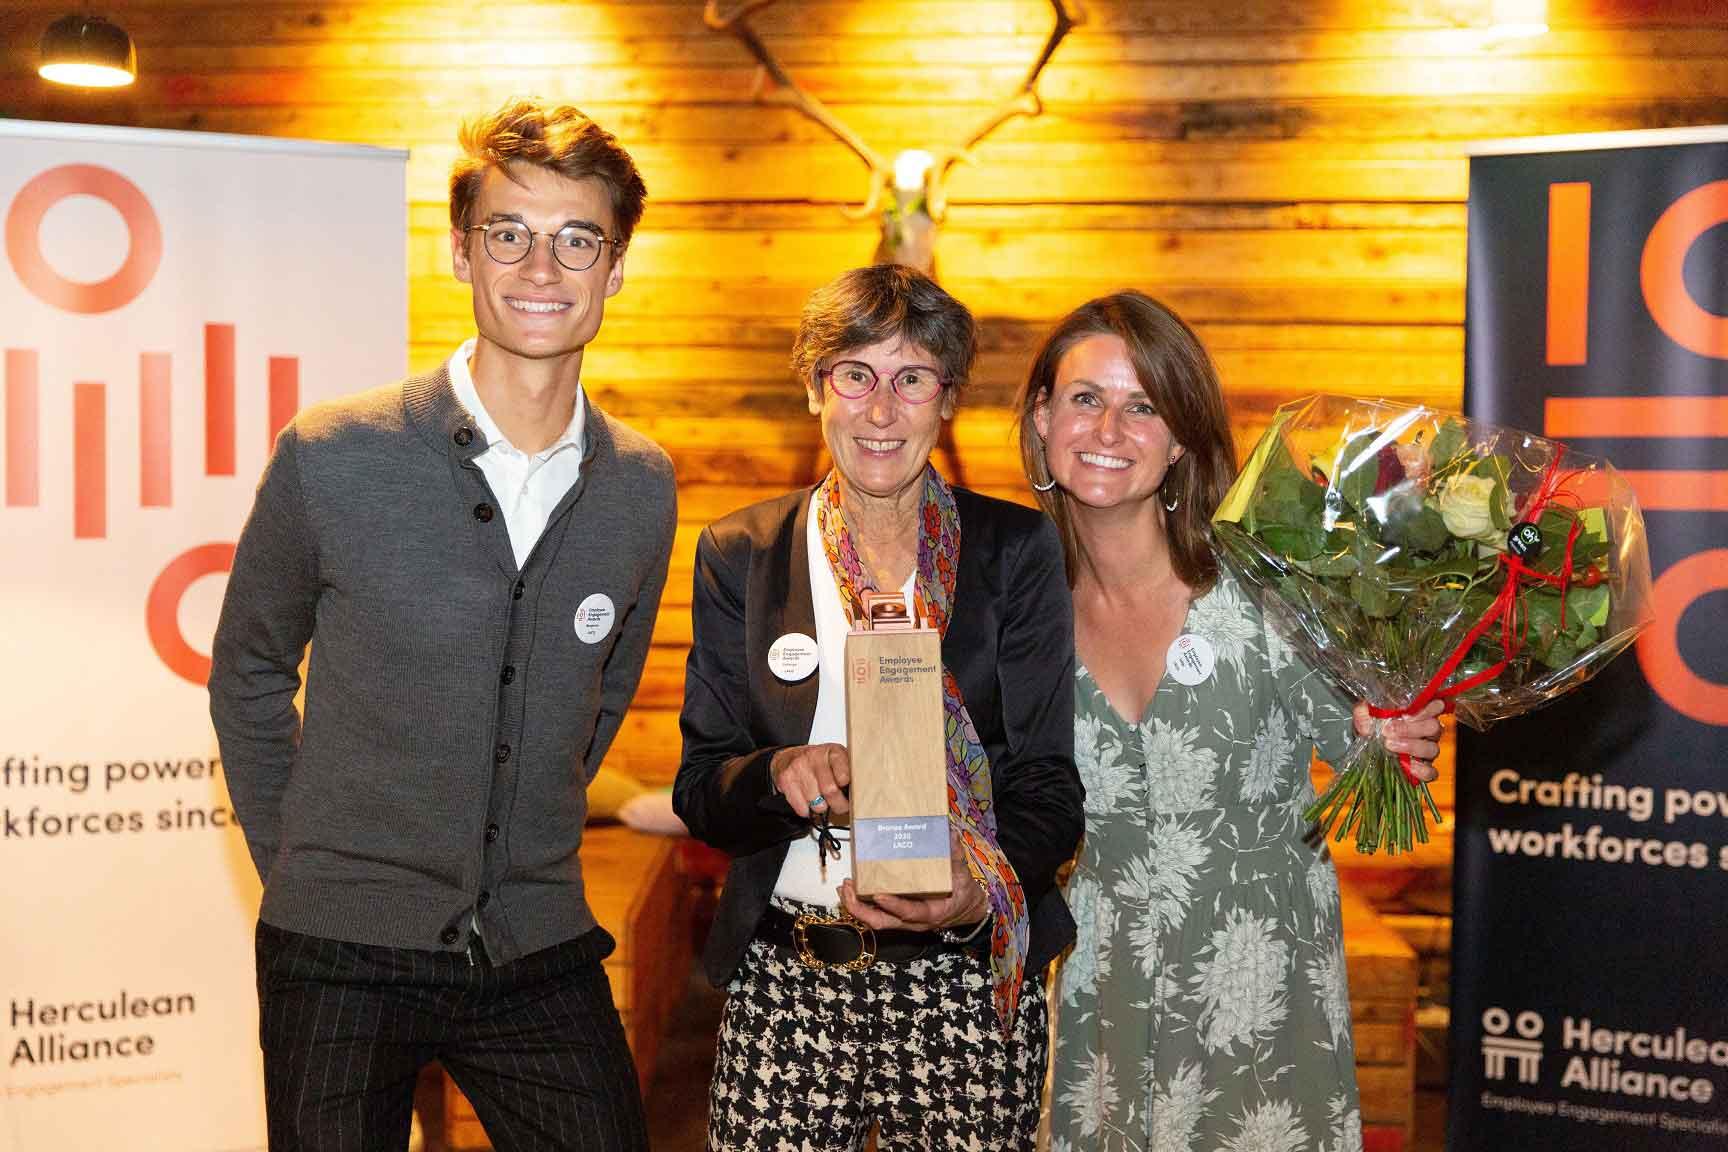 LACO Bronze Winner at Employee Engagement Awards of Herculean Alliance